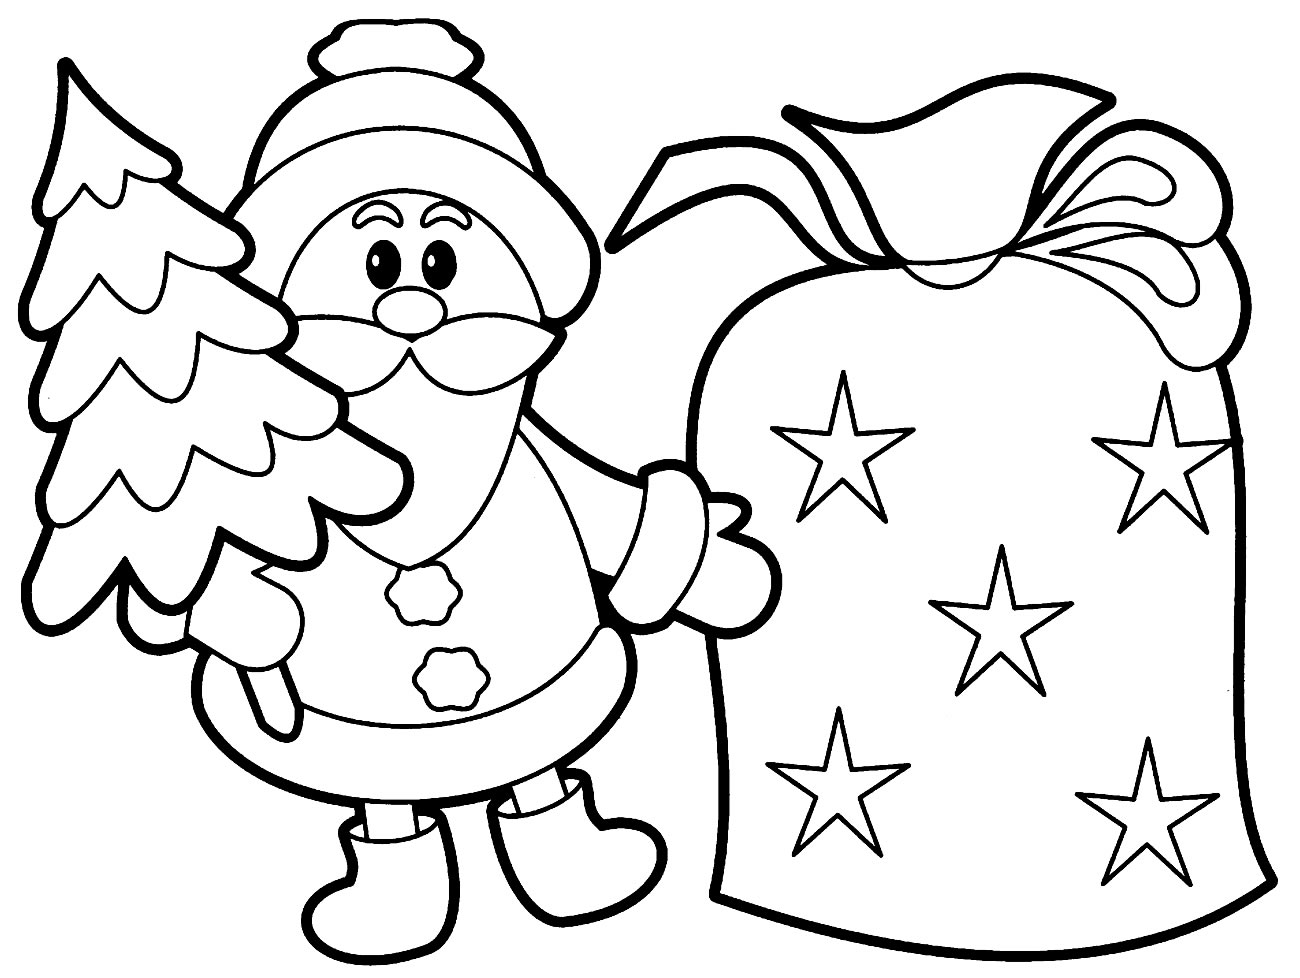 Desenho do Papai Noel para colorir